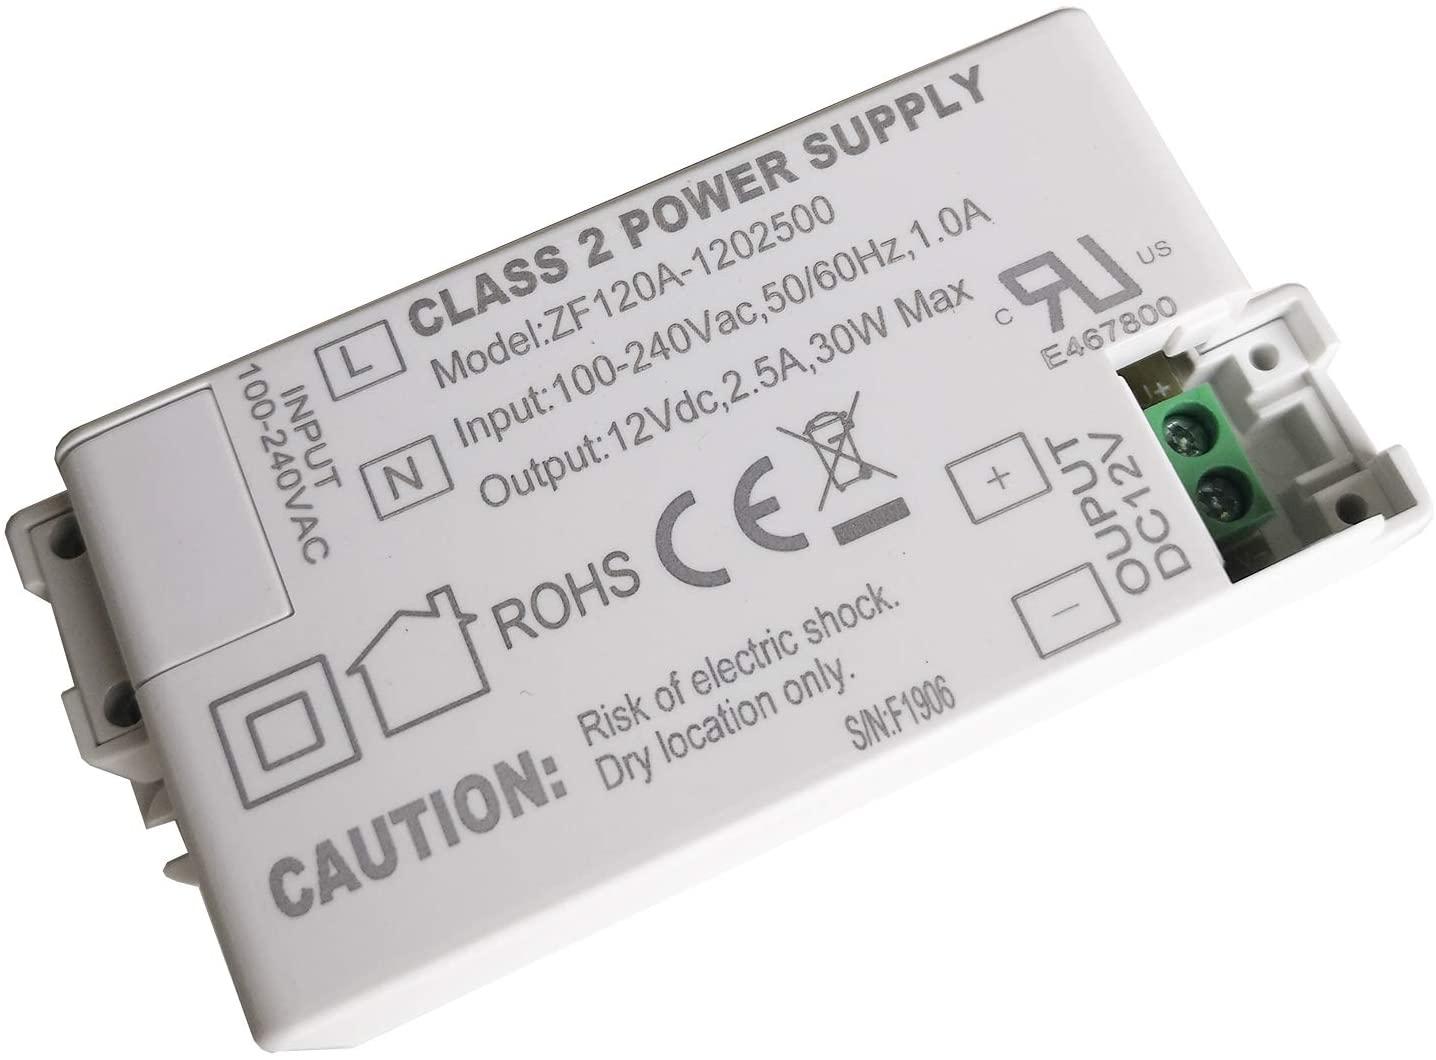 ZF120A-1202500 ZF120A-1205000 12VDC 30W 60W AC/DC Adapter LED Driver for Ceiling Lights Spotlights Buried Fluorescent Lamps,2-Pack (30W)